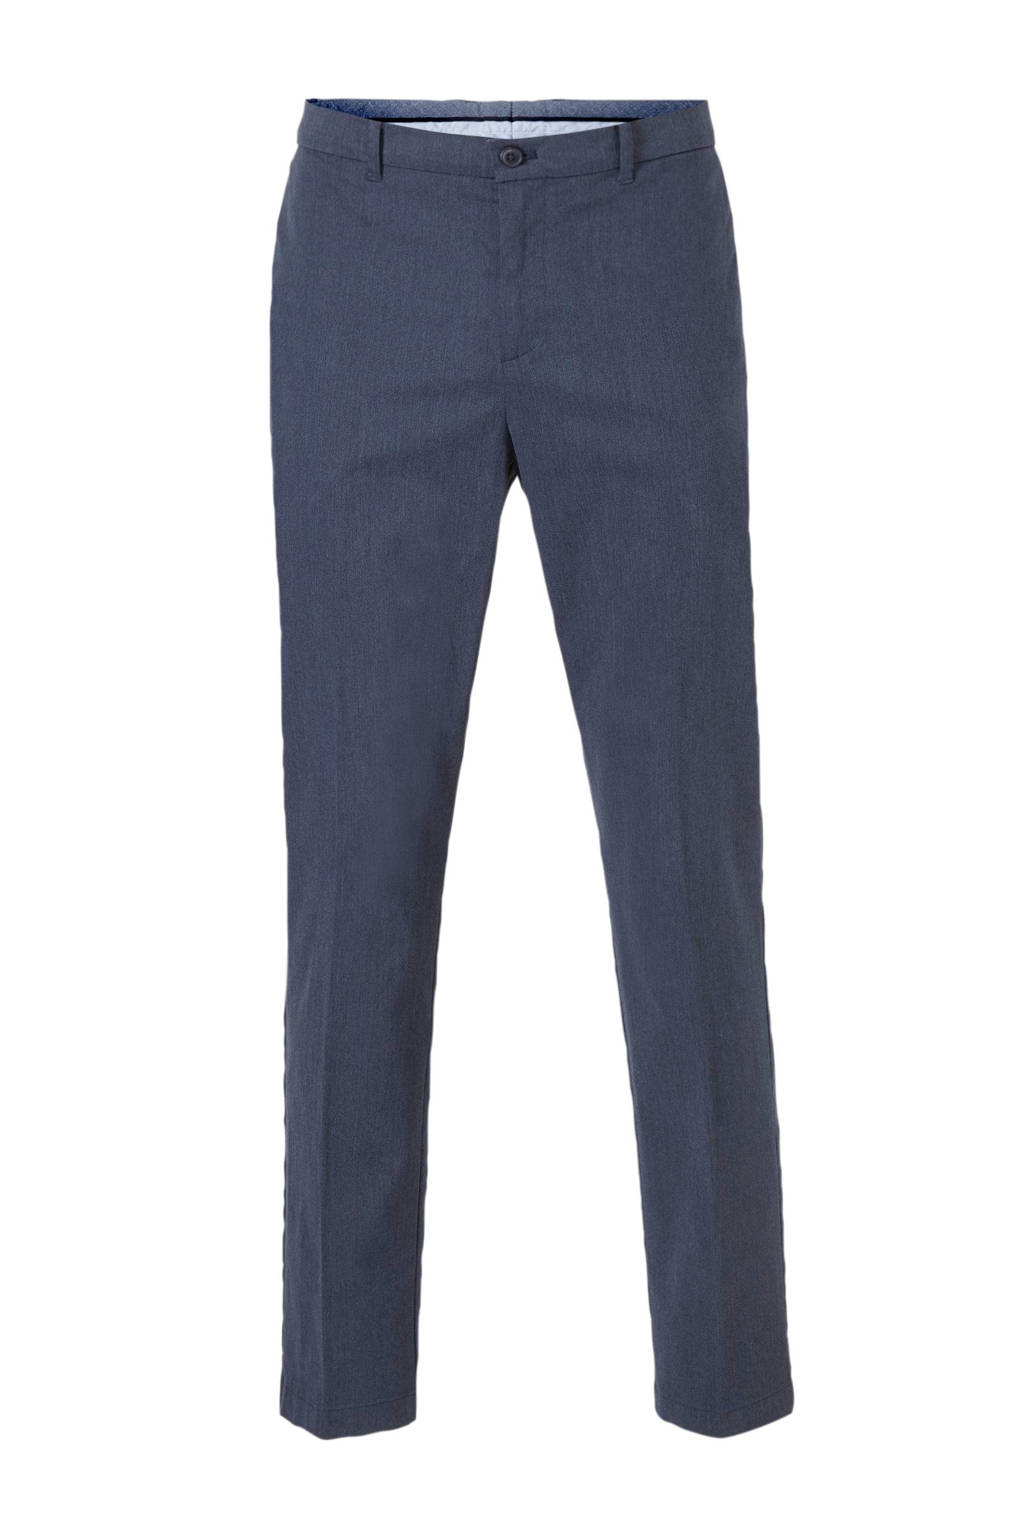 C&A Angelo Litrico slim fit pantalon donkerblauw, Donkerblauw